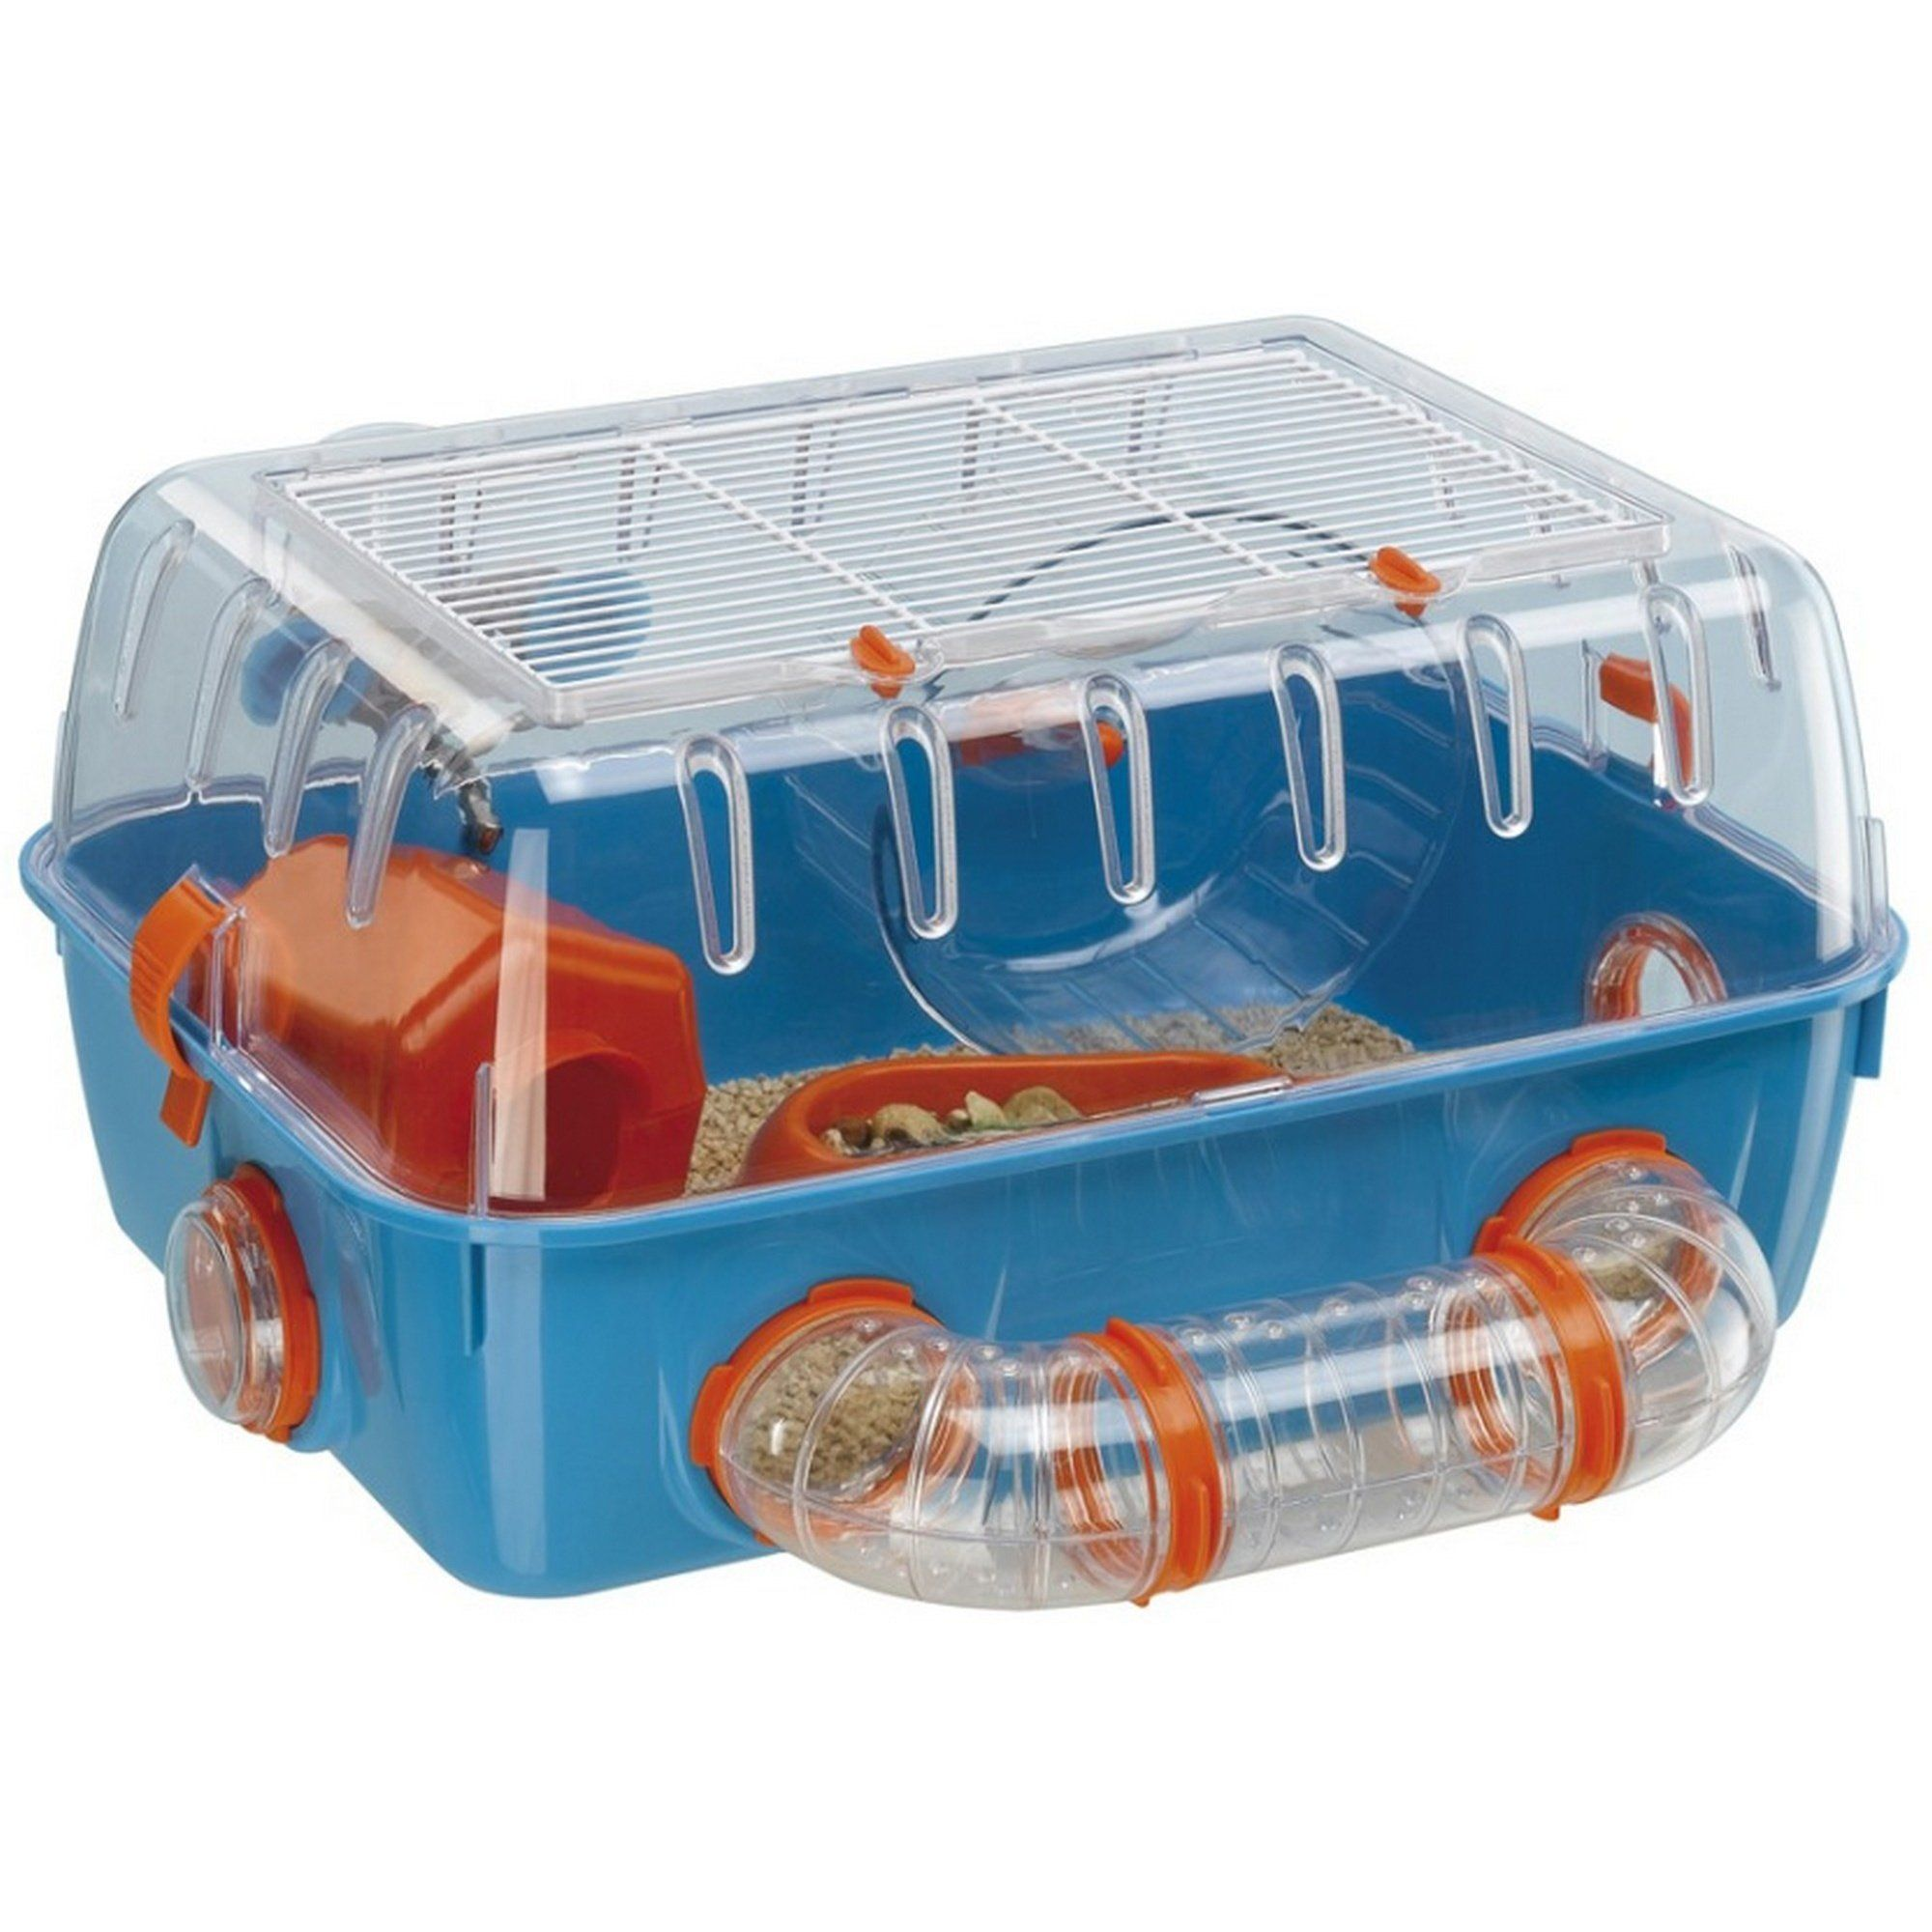 Ferplast Combi 1 Hamster Cage One Size Multicolored